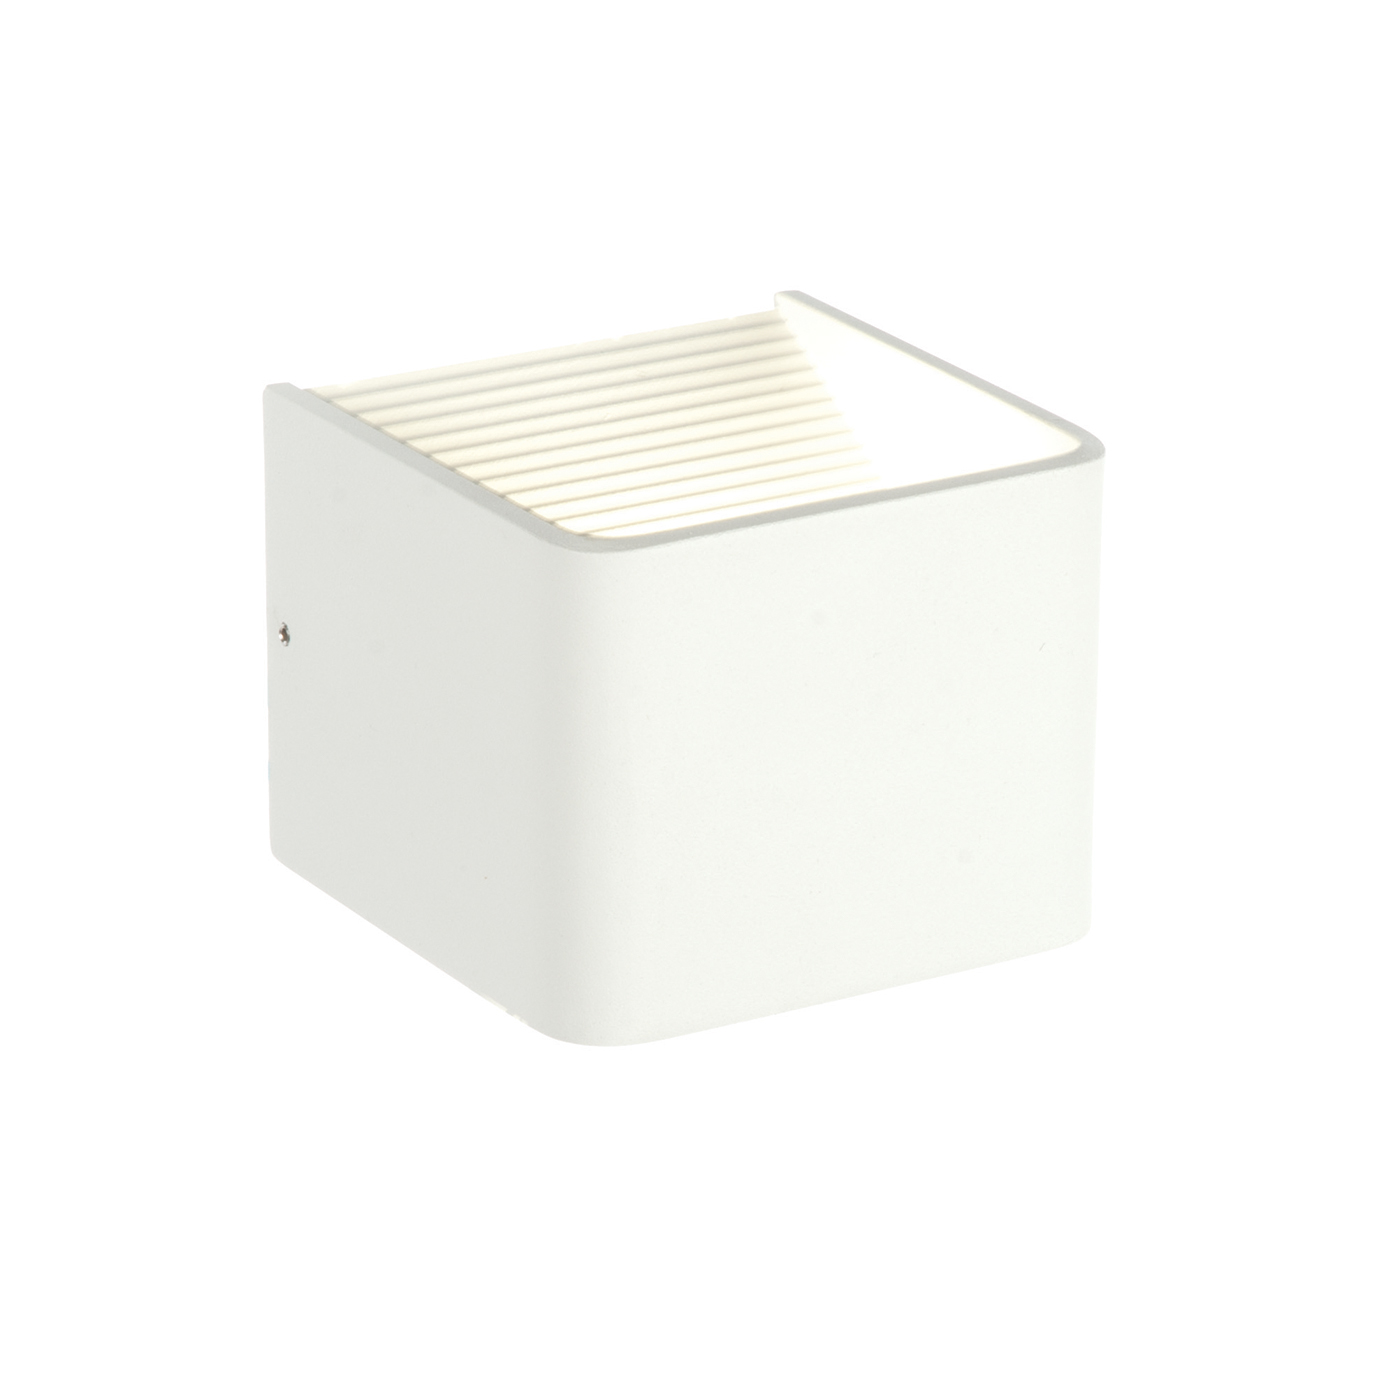 Endon 55591 Slater LED Wall Light